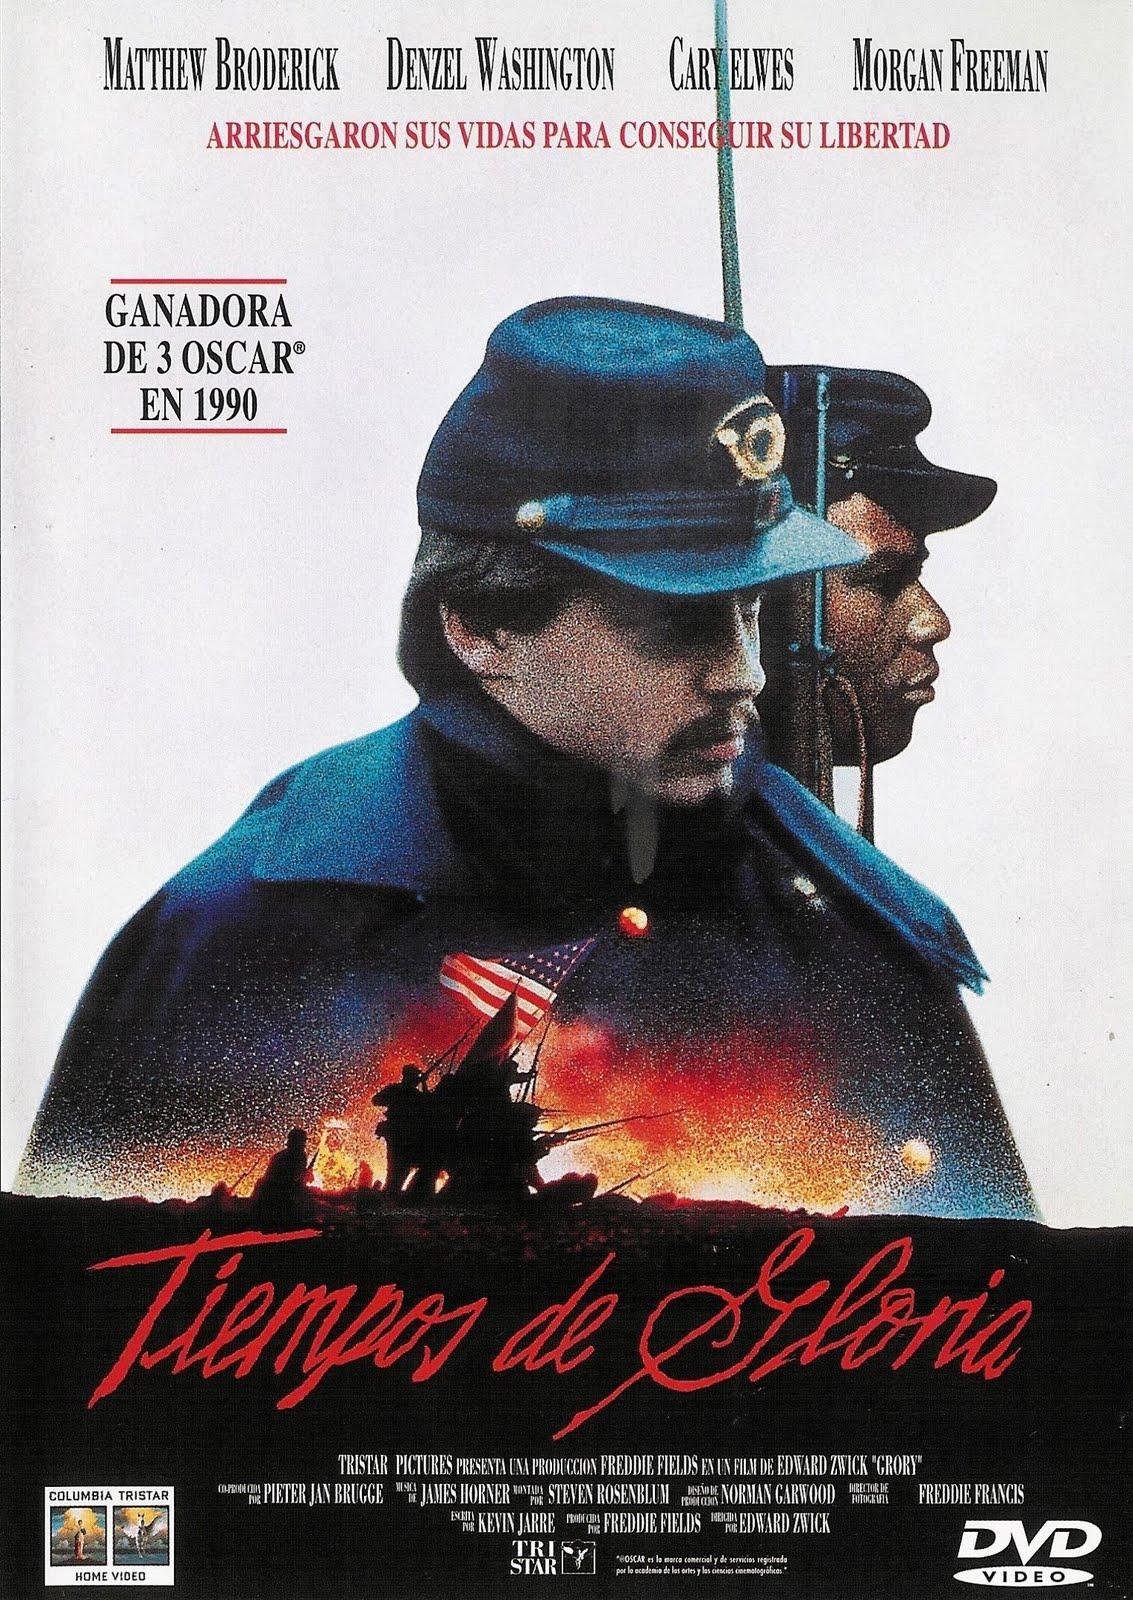 http://1.bp.blogspot.com/_Or369nWS8Hc/TIHMyPGJonI/AAAAAAAAAdU/zB-bckzjj6A/s1600/glory+1989+Edward+Zwick+dvd+argentina.jpg